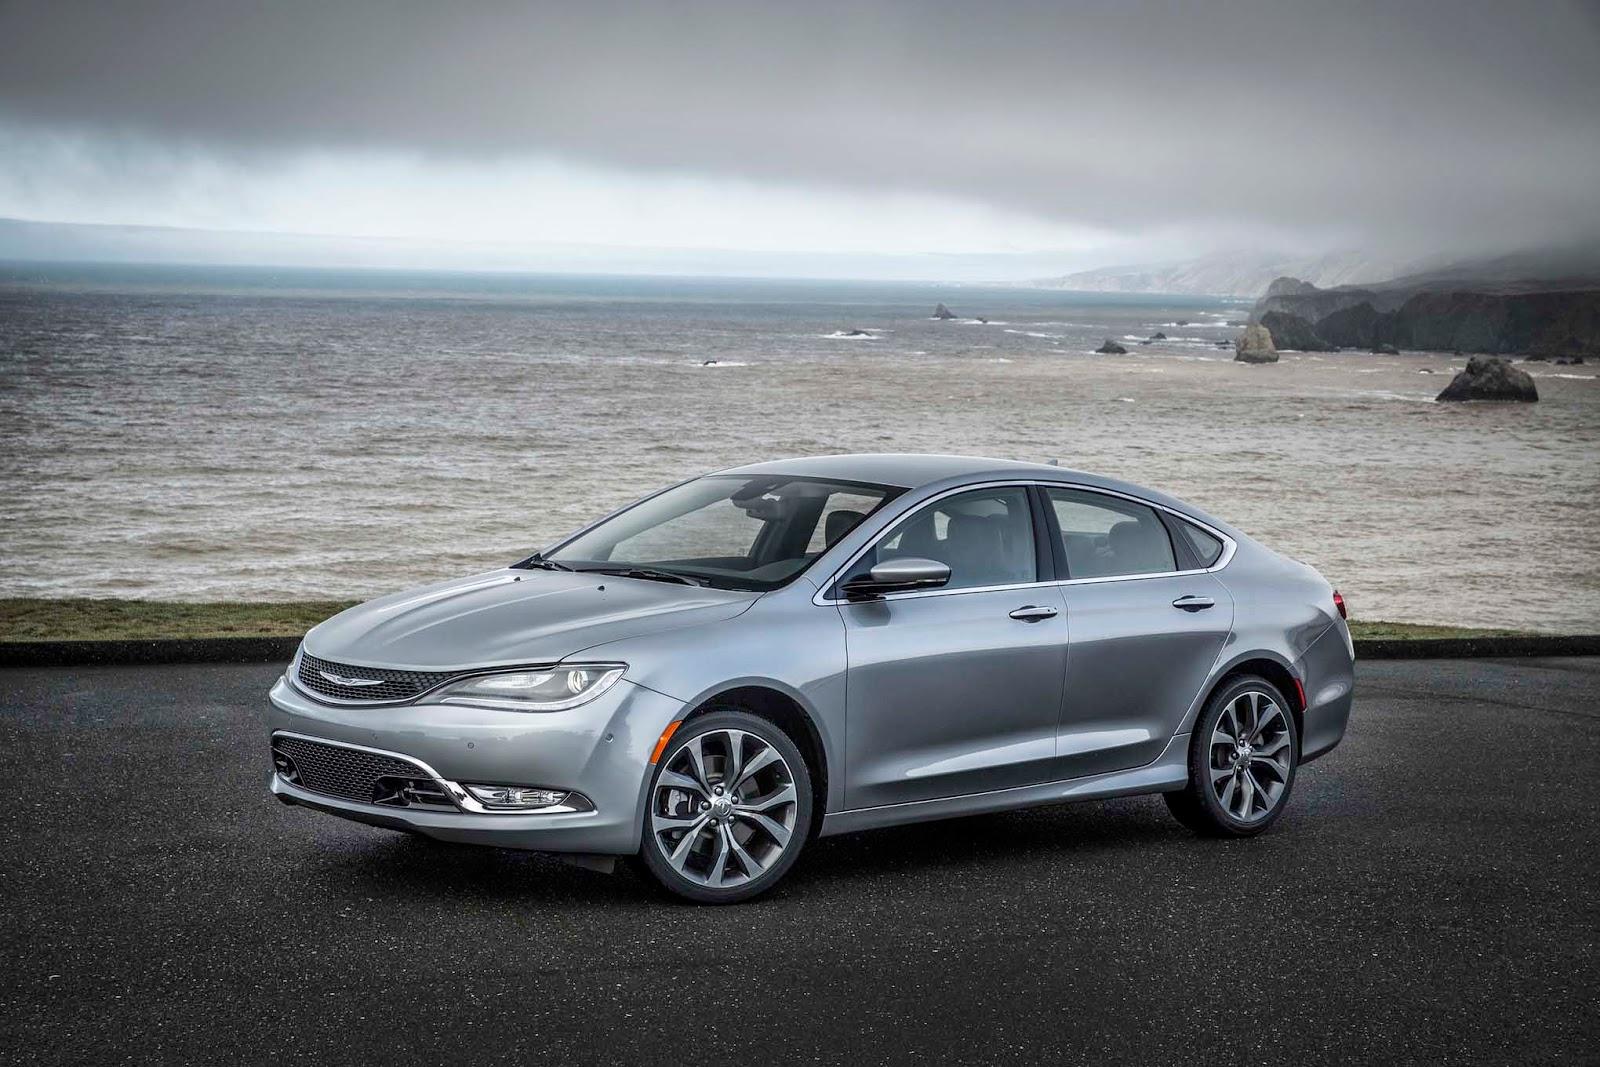 2016 Chrysler 200 Limited >> 2015 Chrysler 200 C/S | Photos Gallery ~ Autos